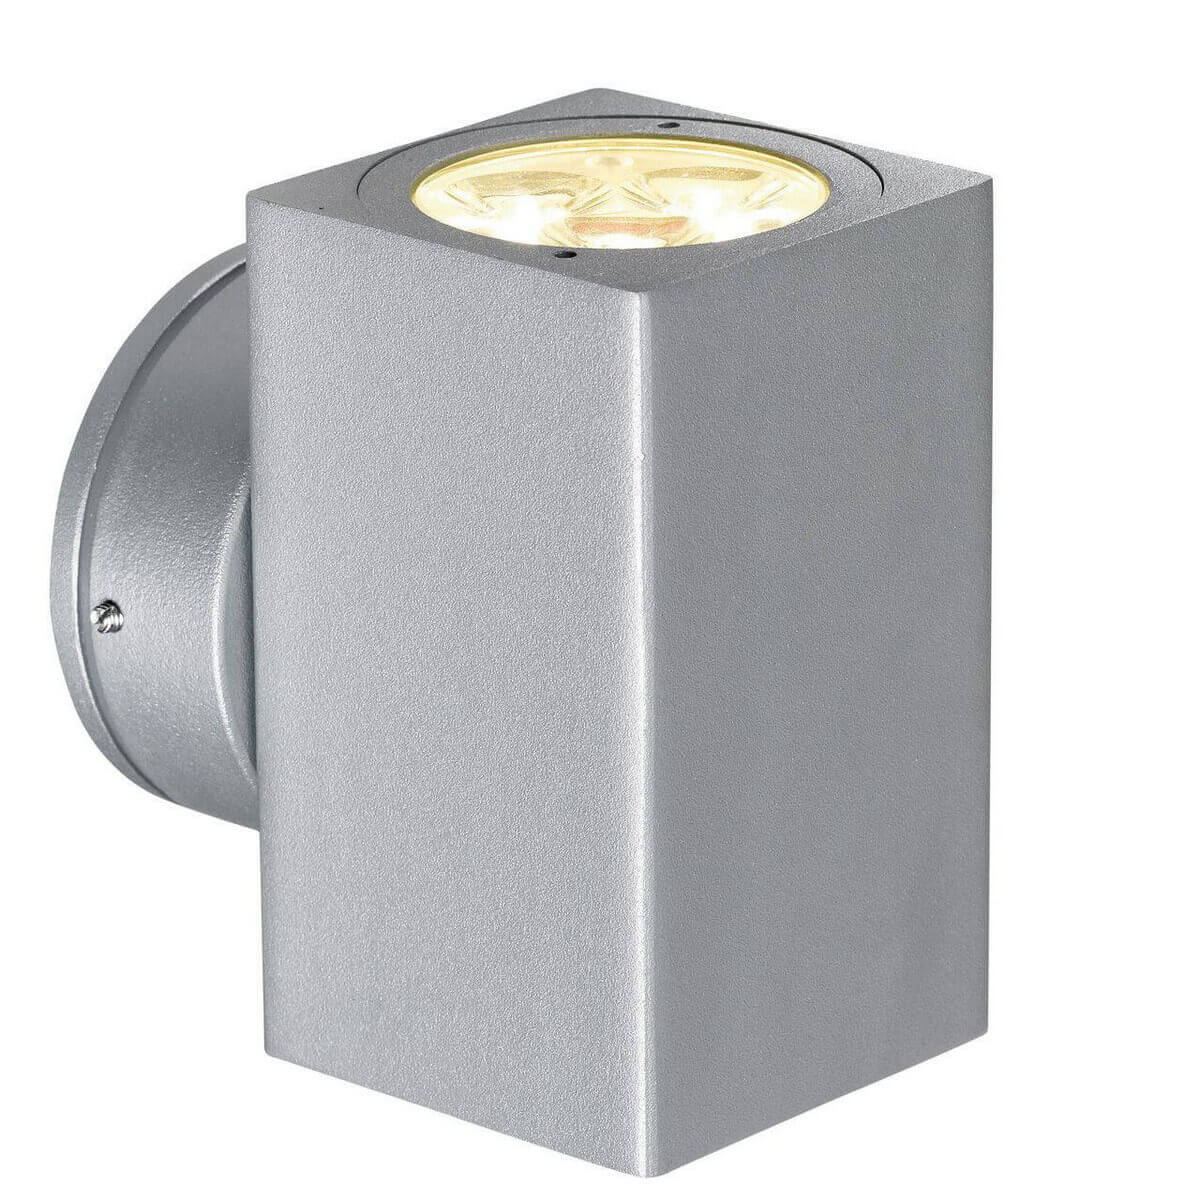 Светильник Markslojd 101989 Dante